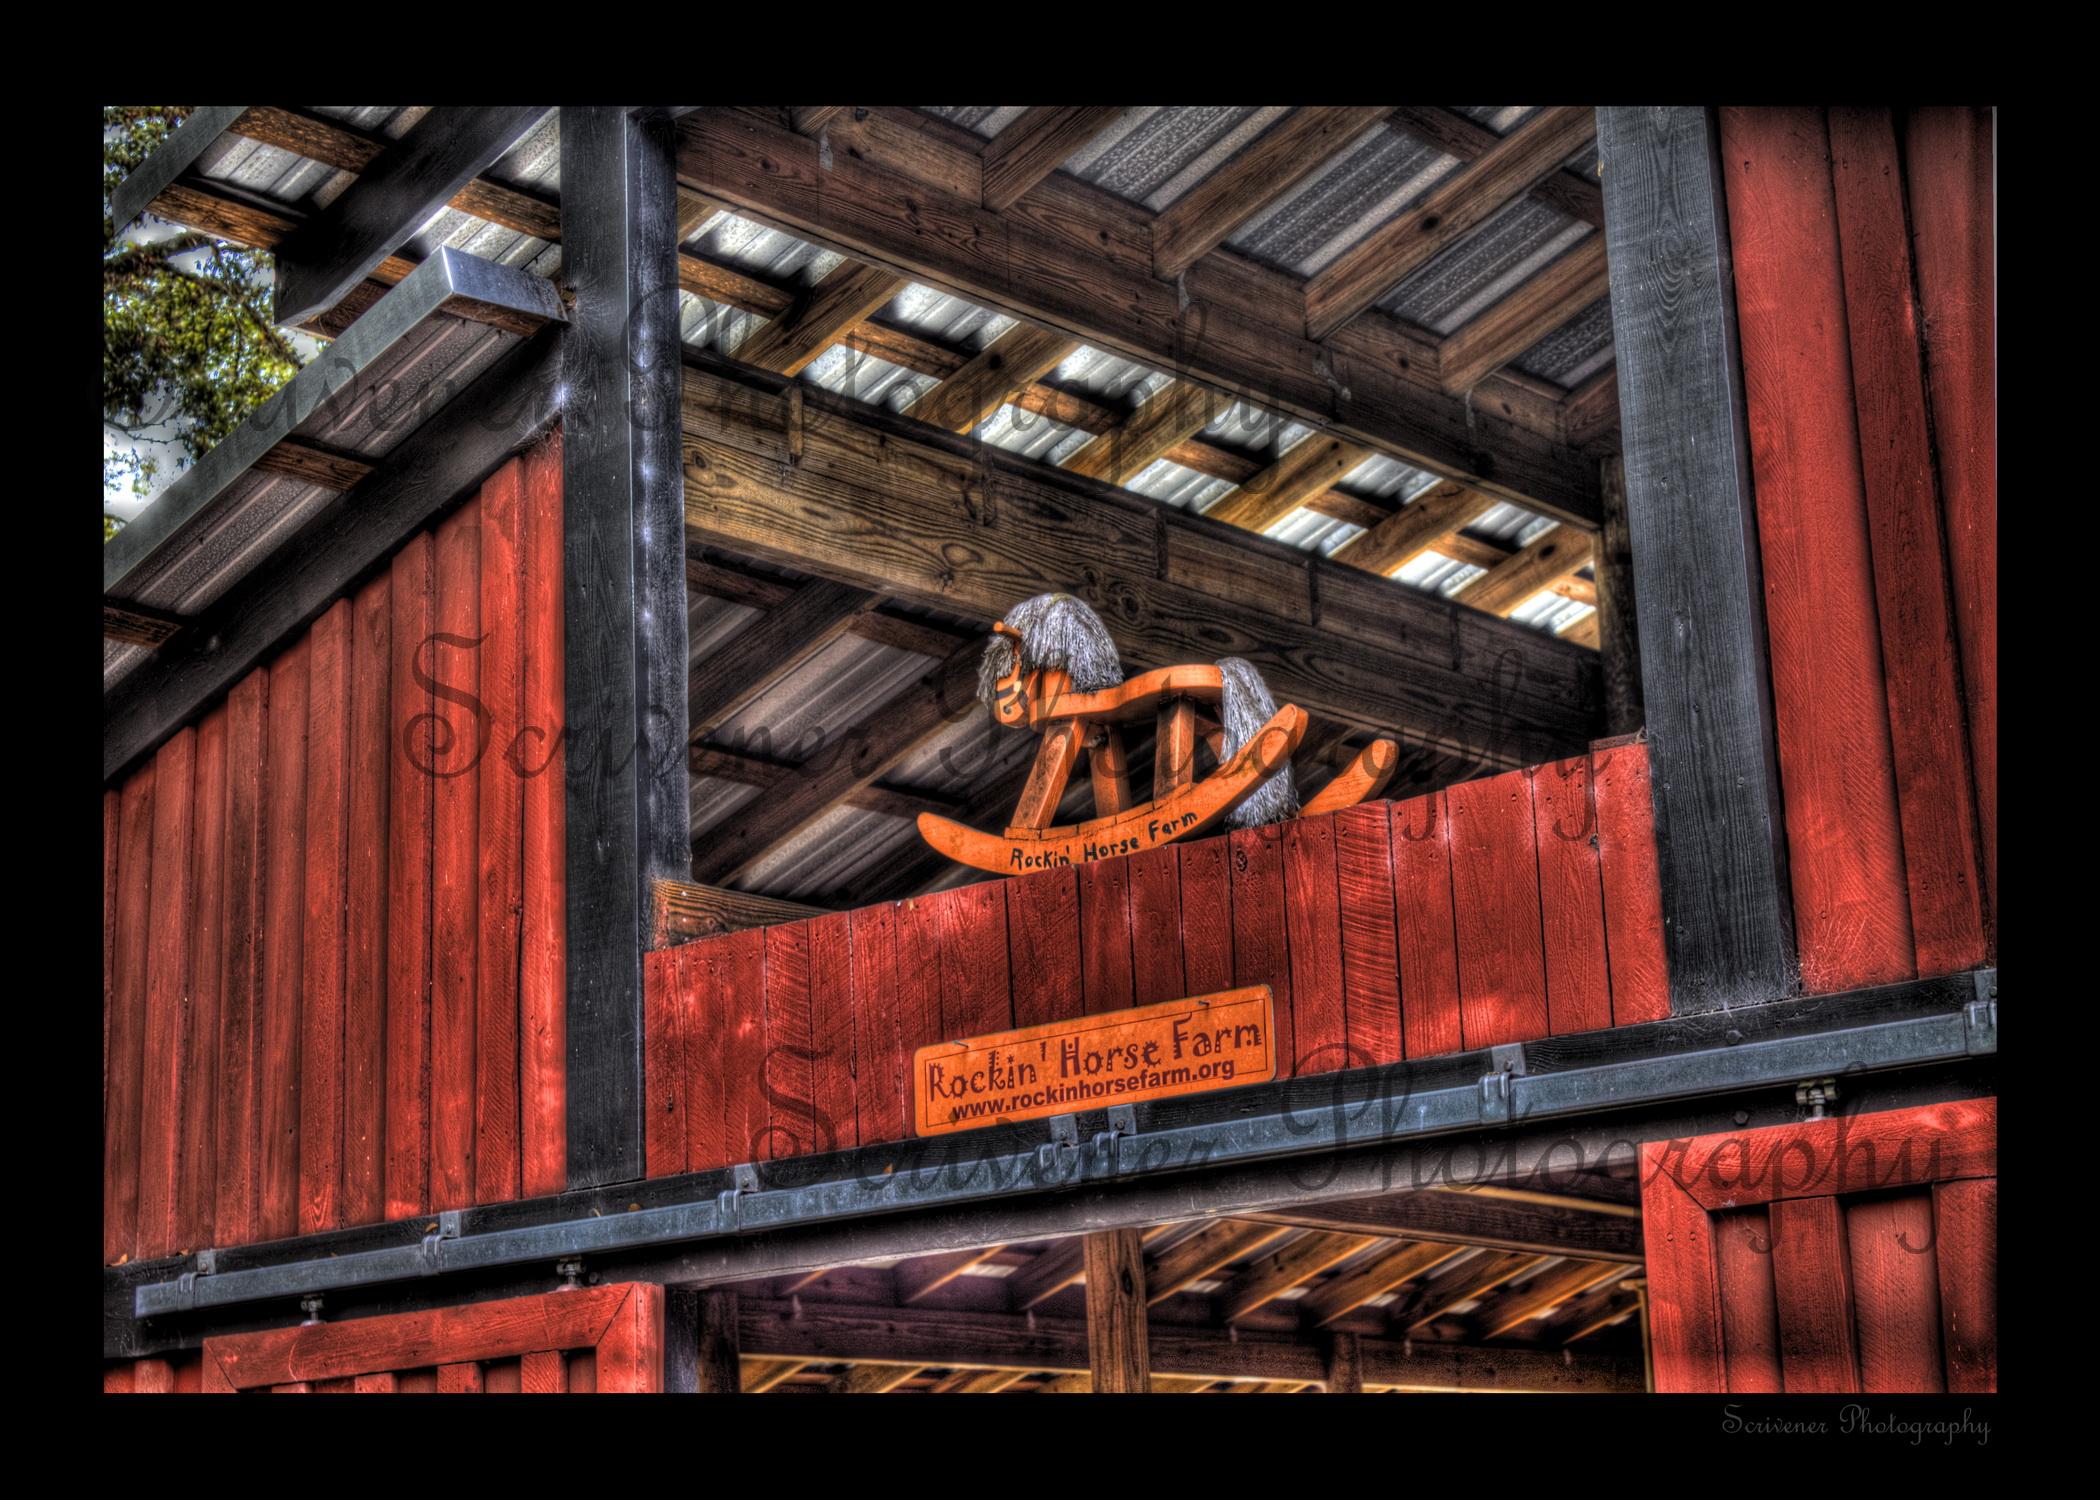 Rockin Horse Farm A Truly Inspirational Place Scrivener